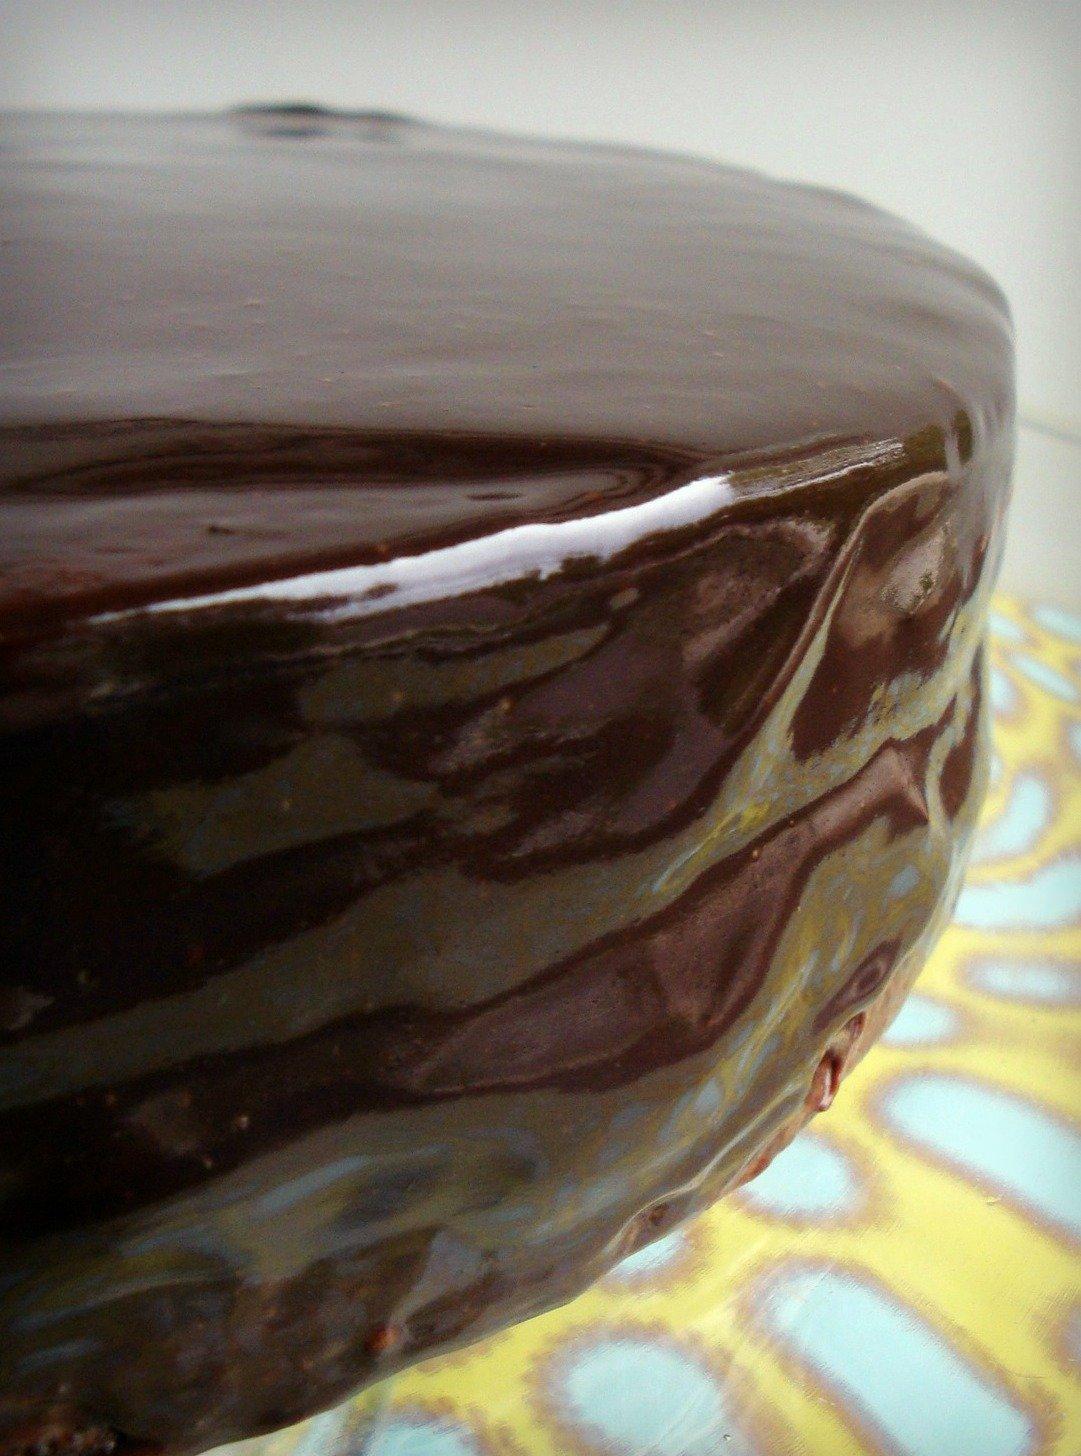 Super Moist Chocolate Cake - Gluten Free! – Good Dinner Mom